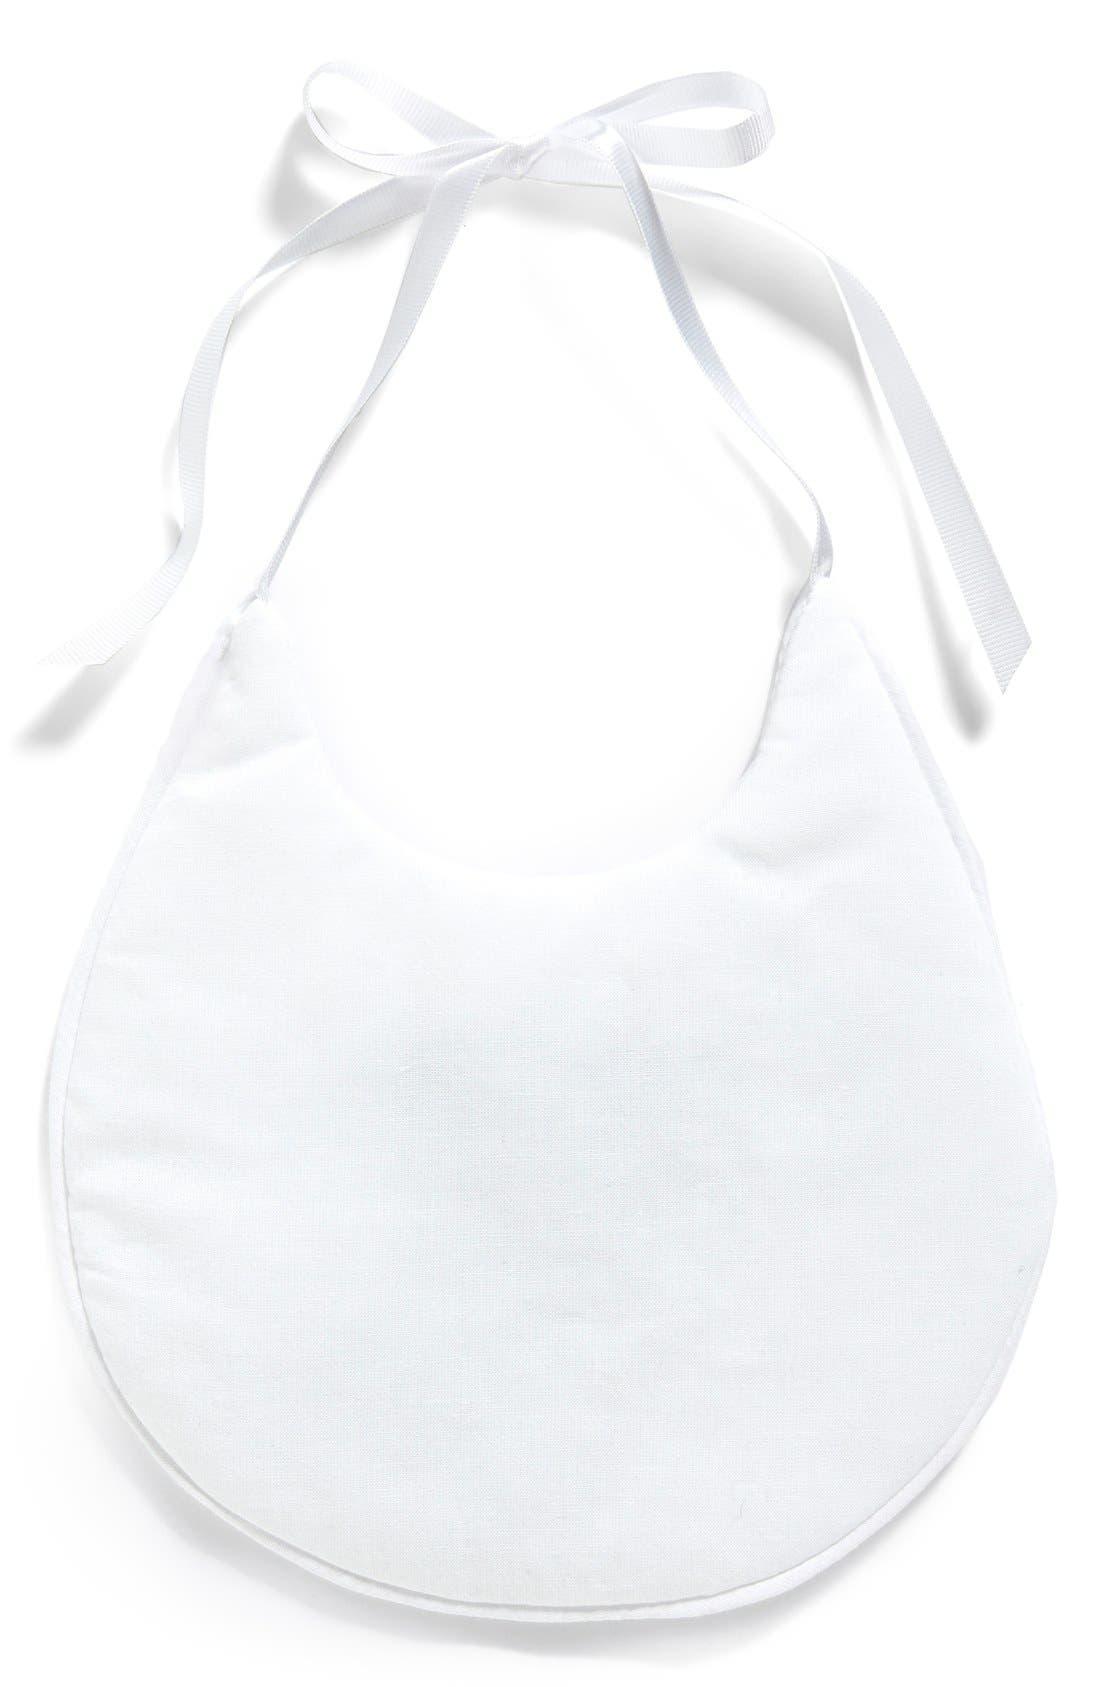 Cotton Bib,                             Main thumbnail 1, color,                             WHITE